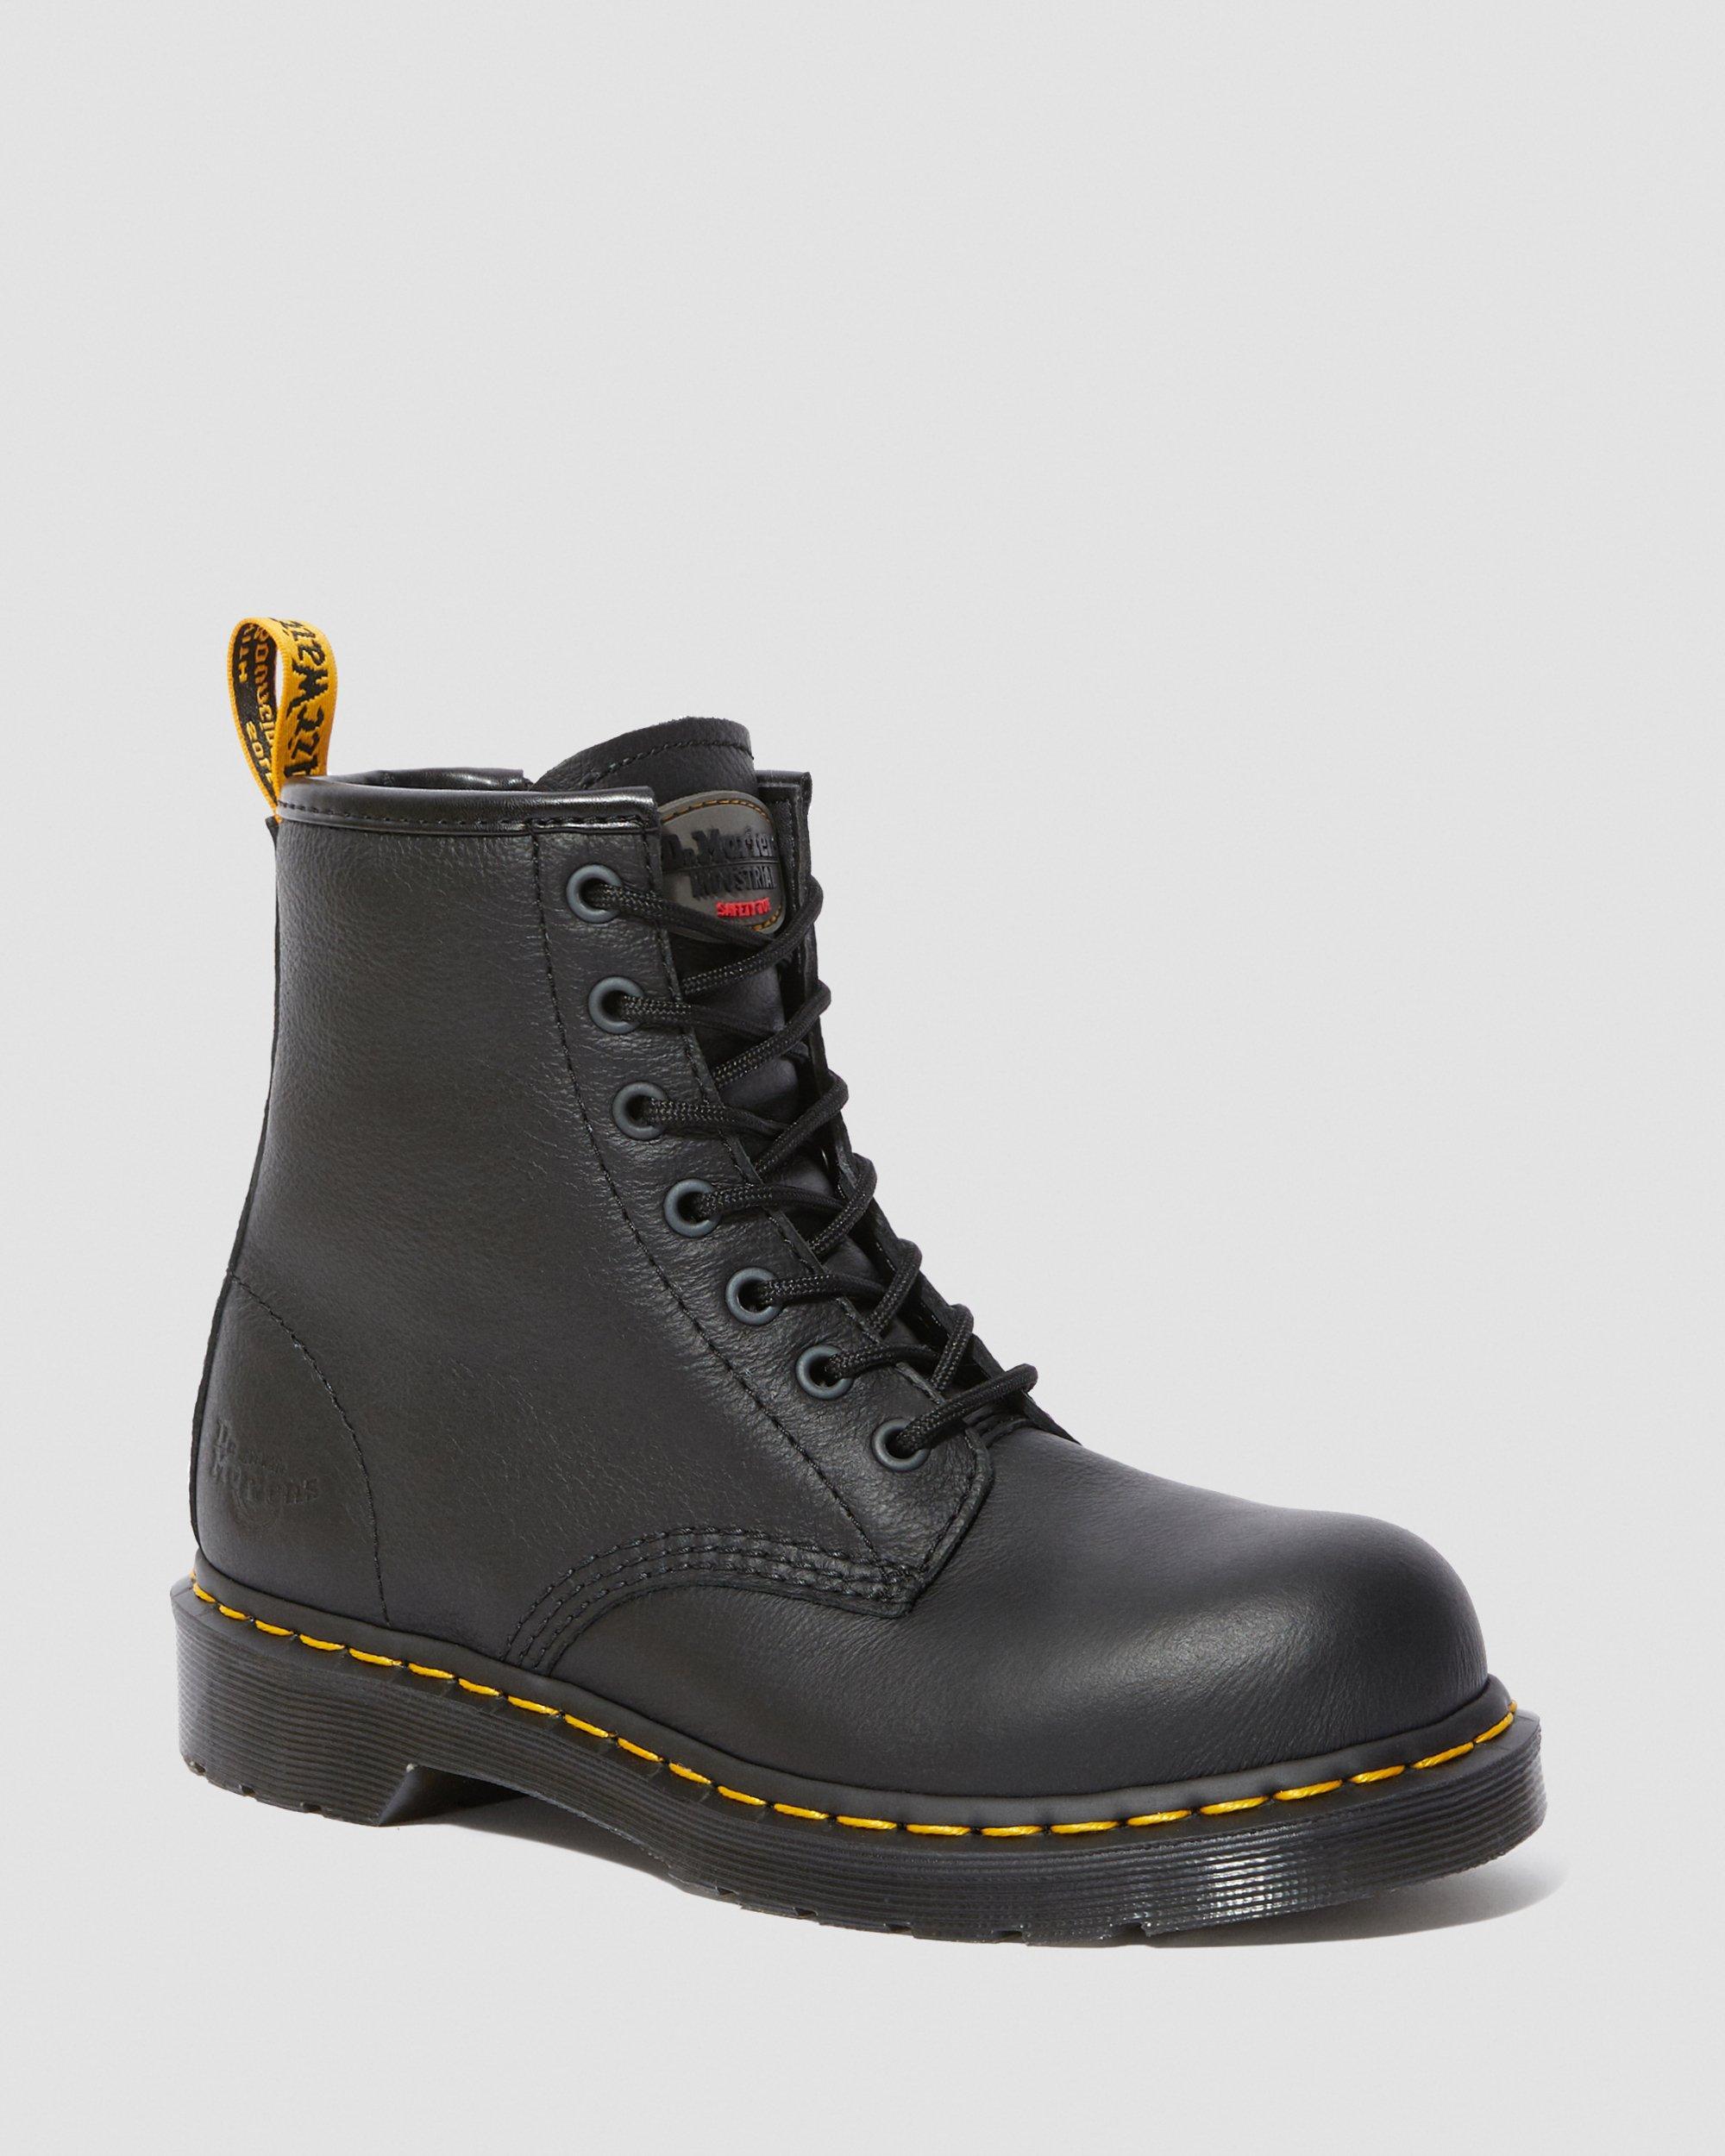 doc martins work boots